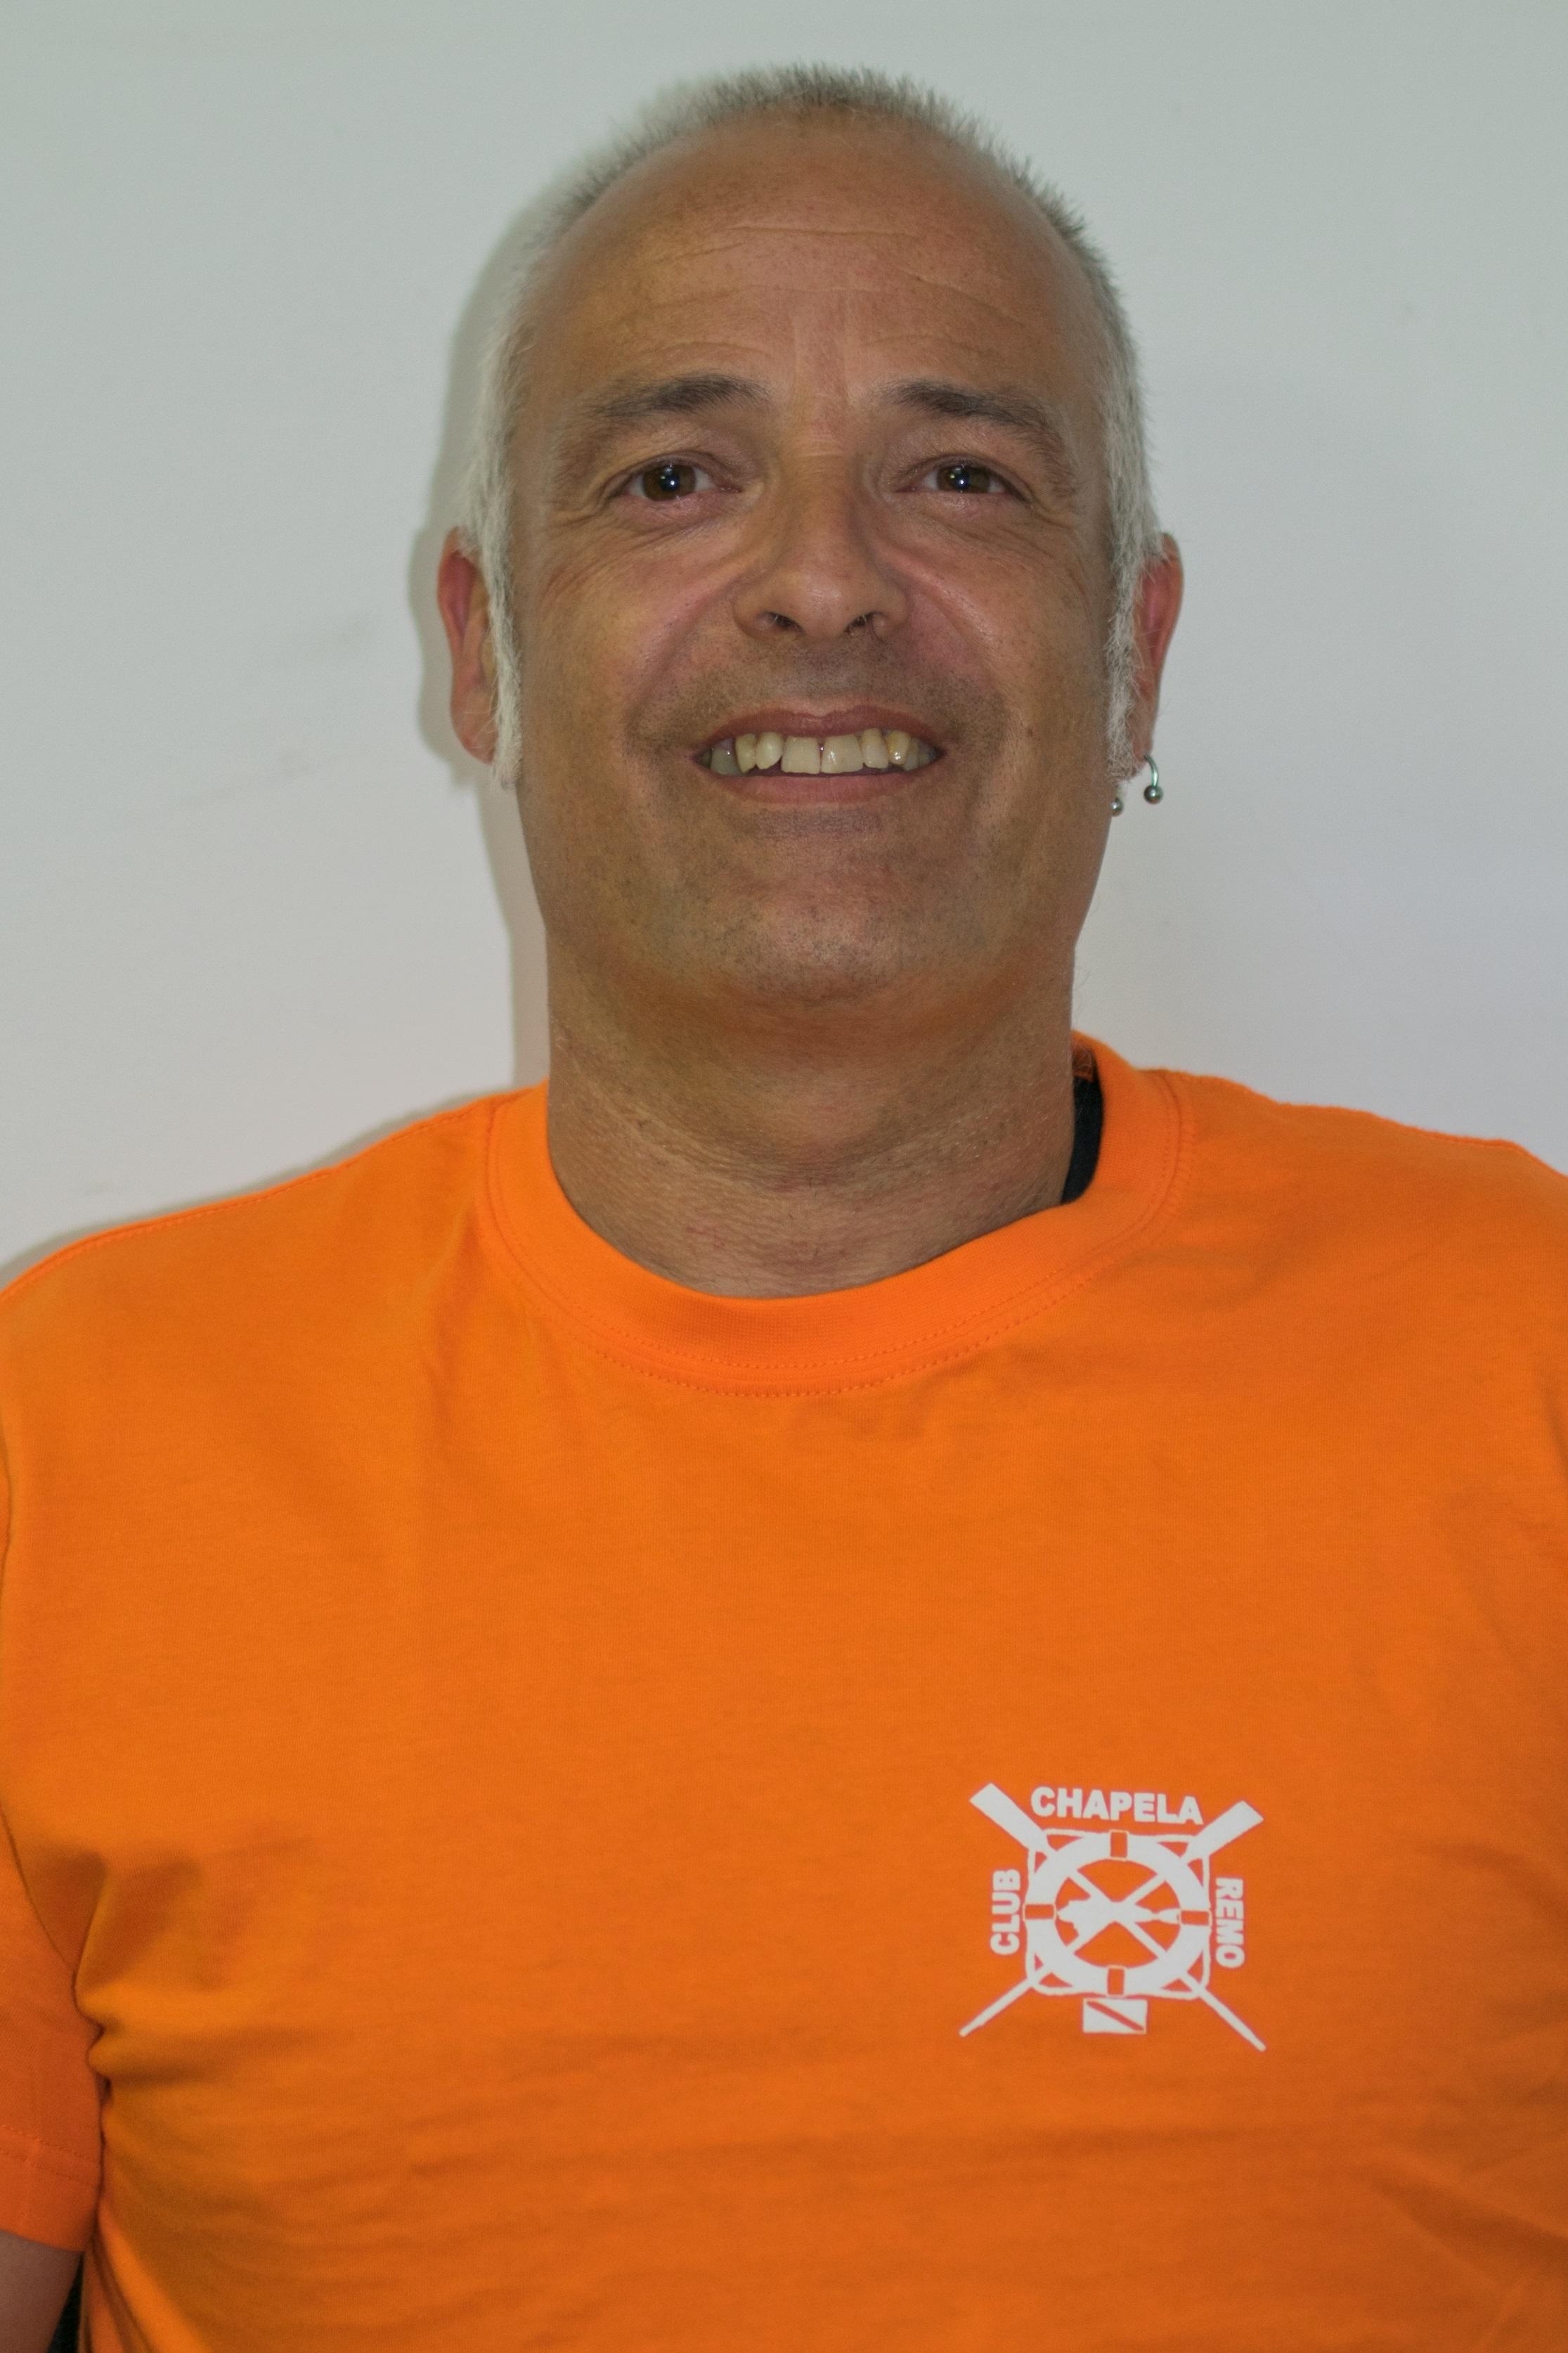 Francisco M. Glez. - PROPIO